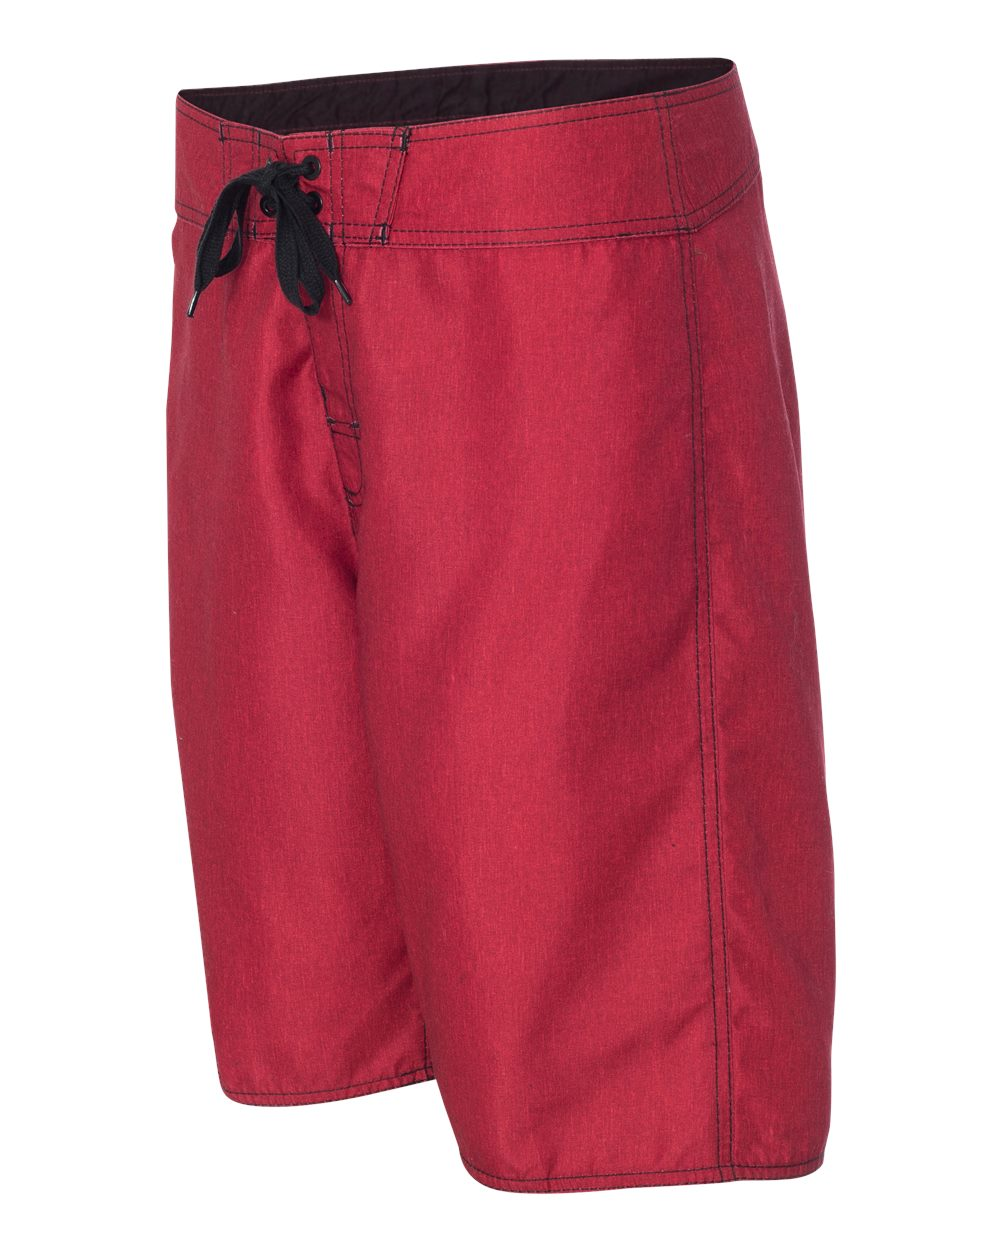 Burnside-Men-039-s-Heathered-Board-Shorts-B9305-30-40 thumbnail 12